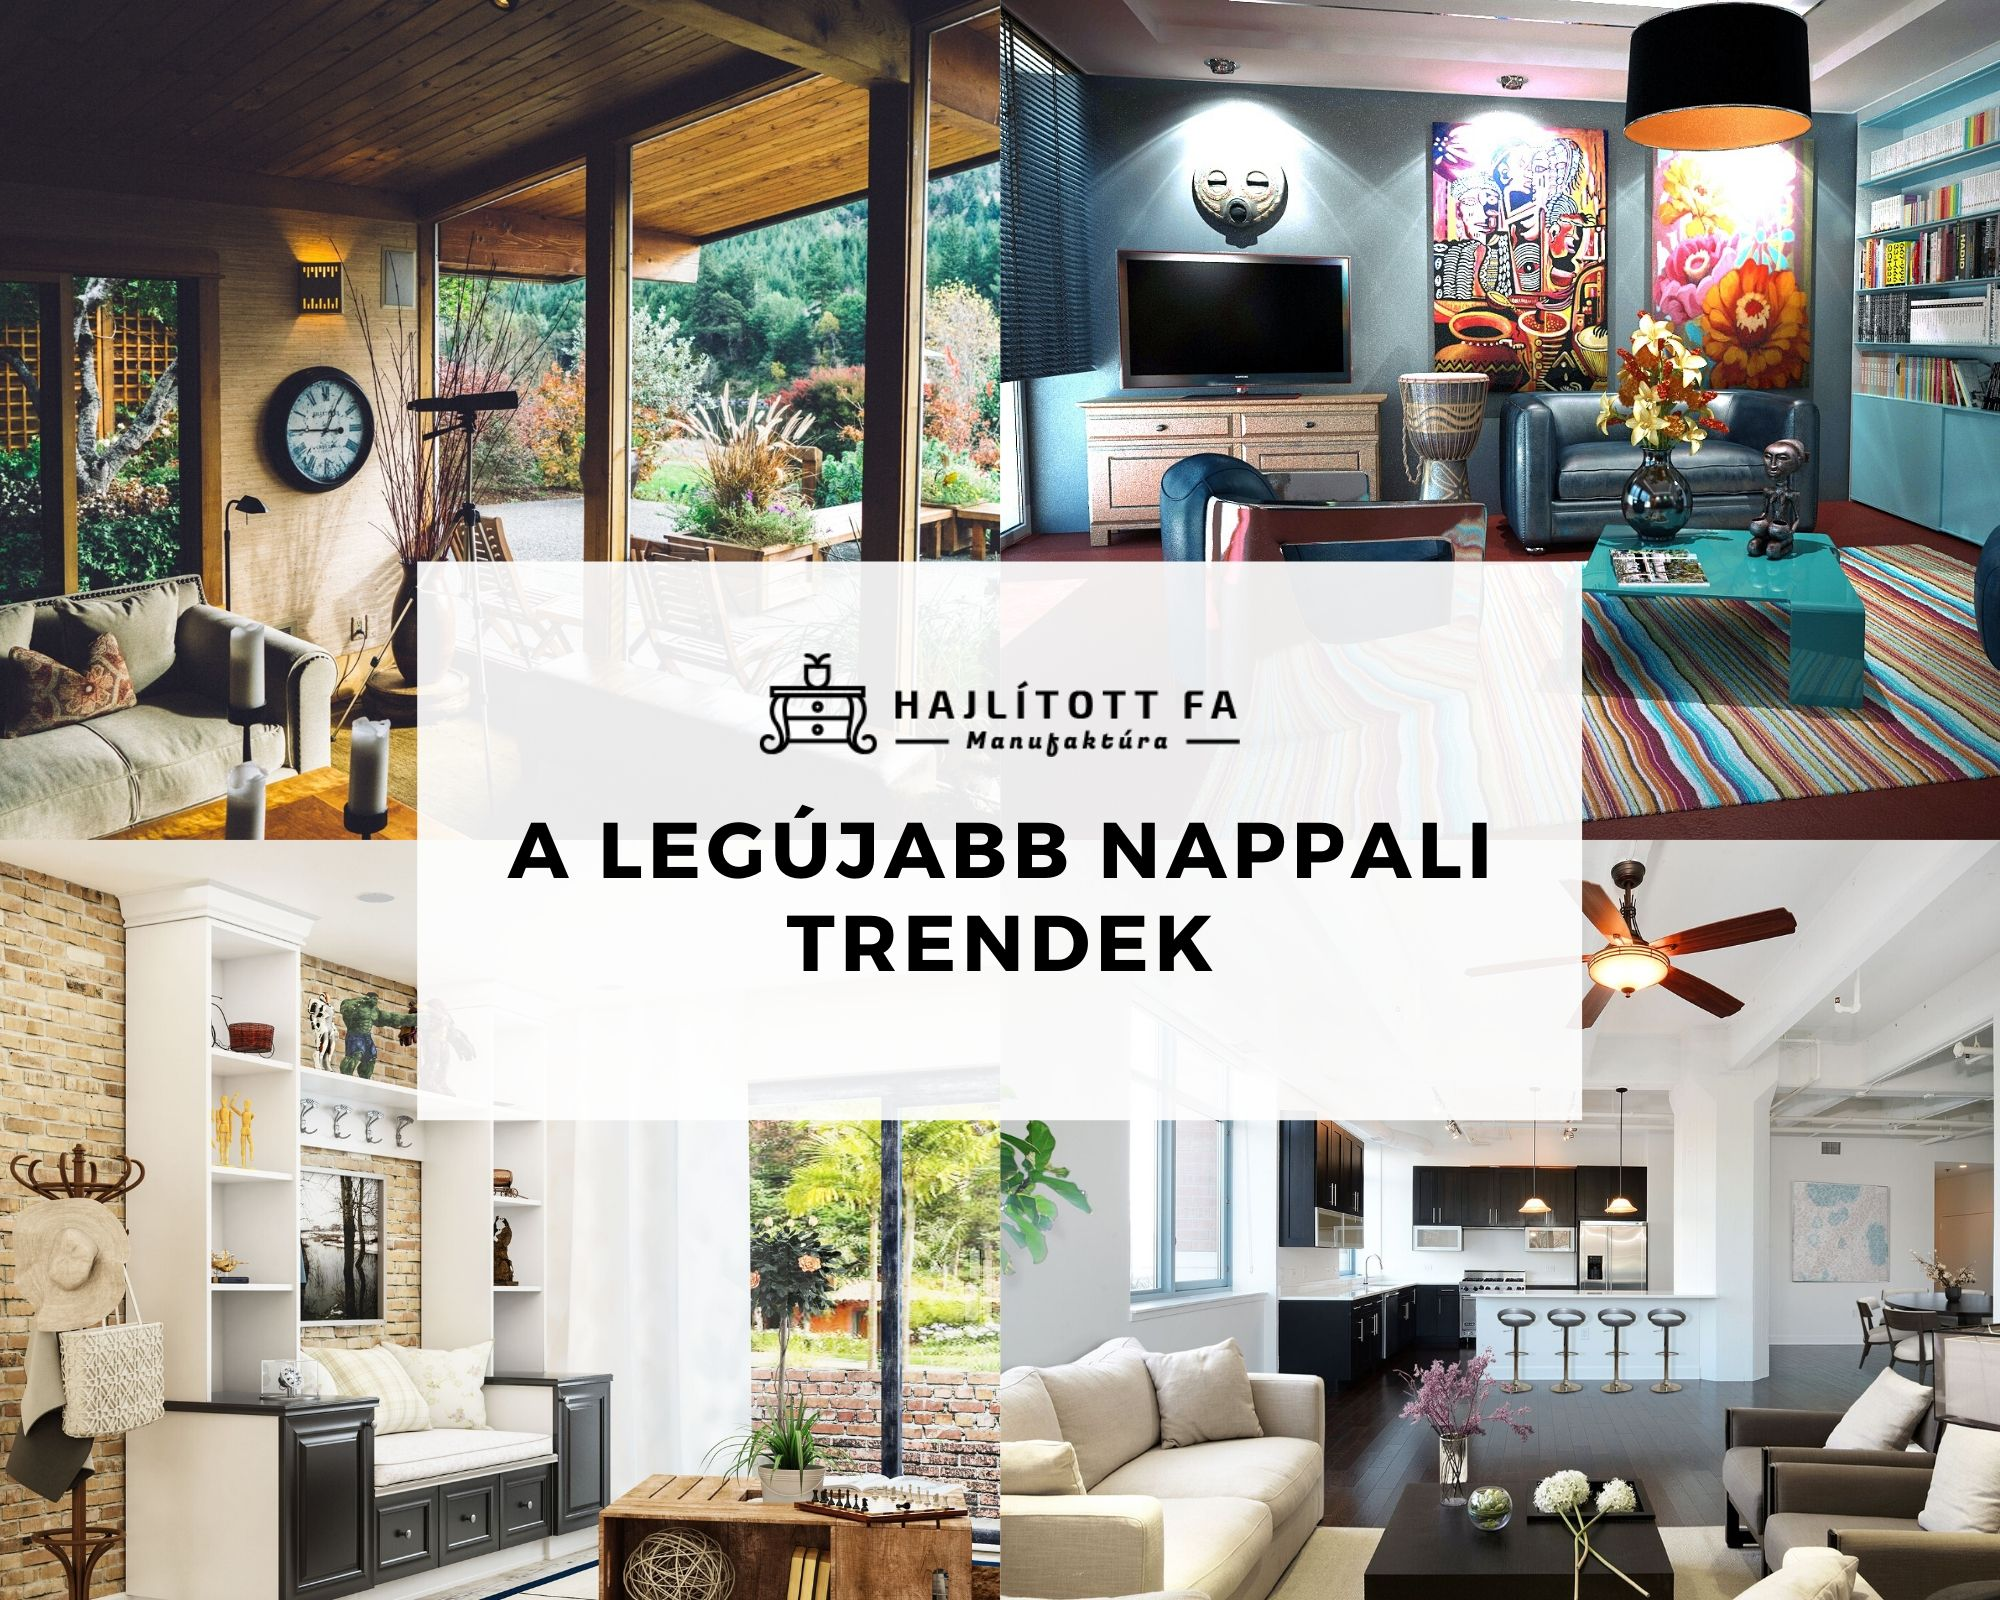 Modern nappali berendezés 2020-luxus bútorok vagy minimalista design?